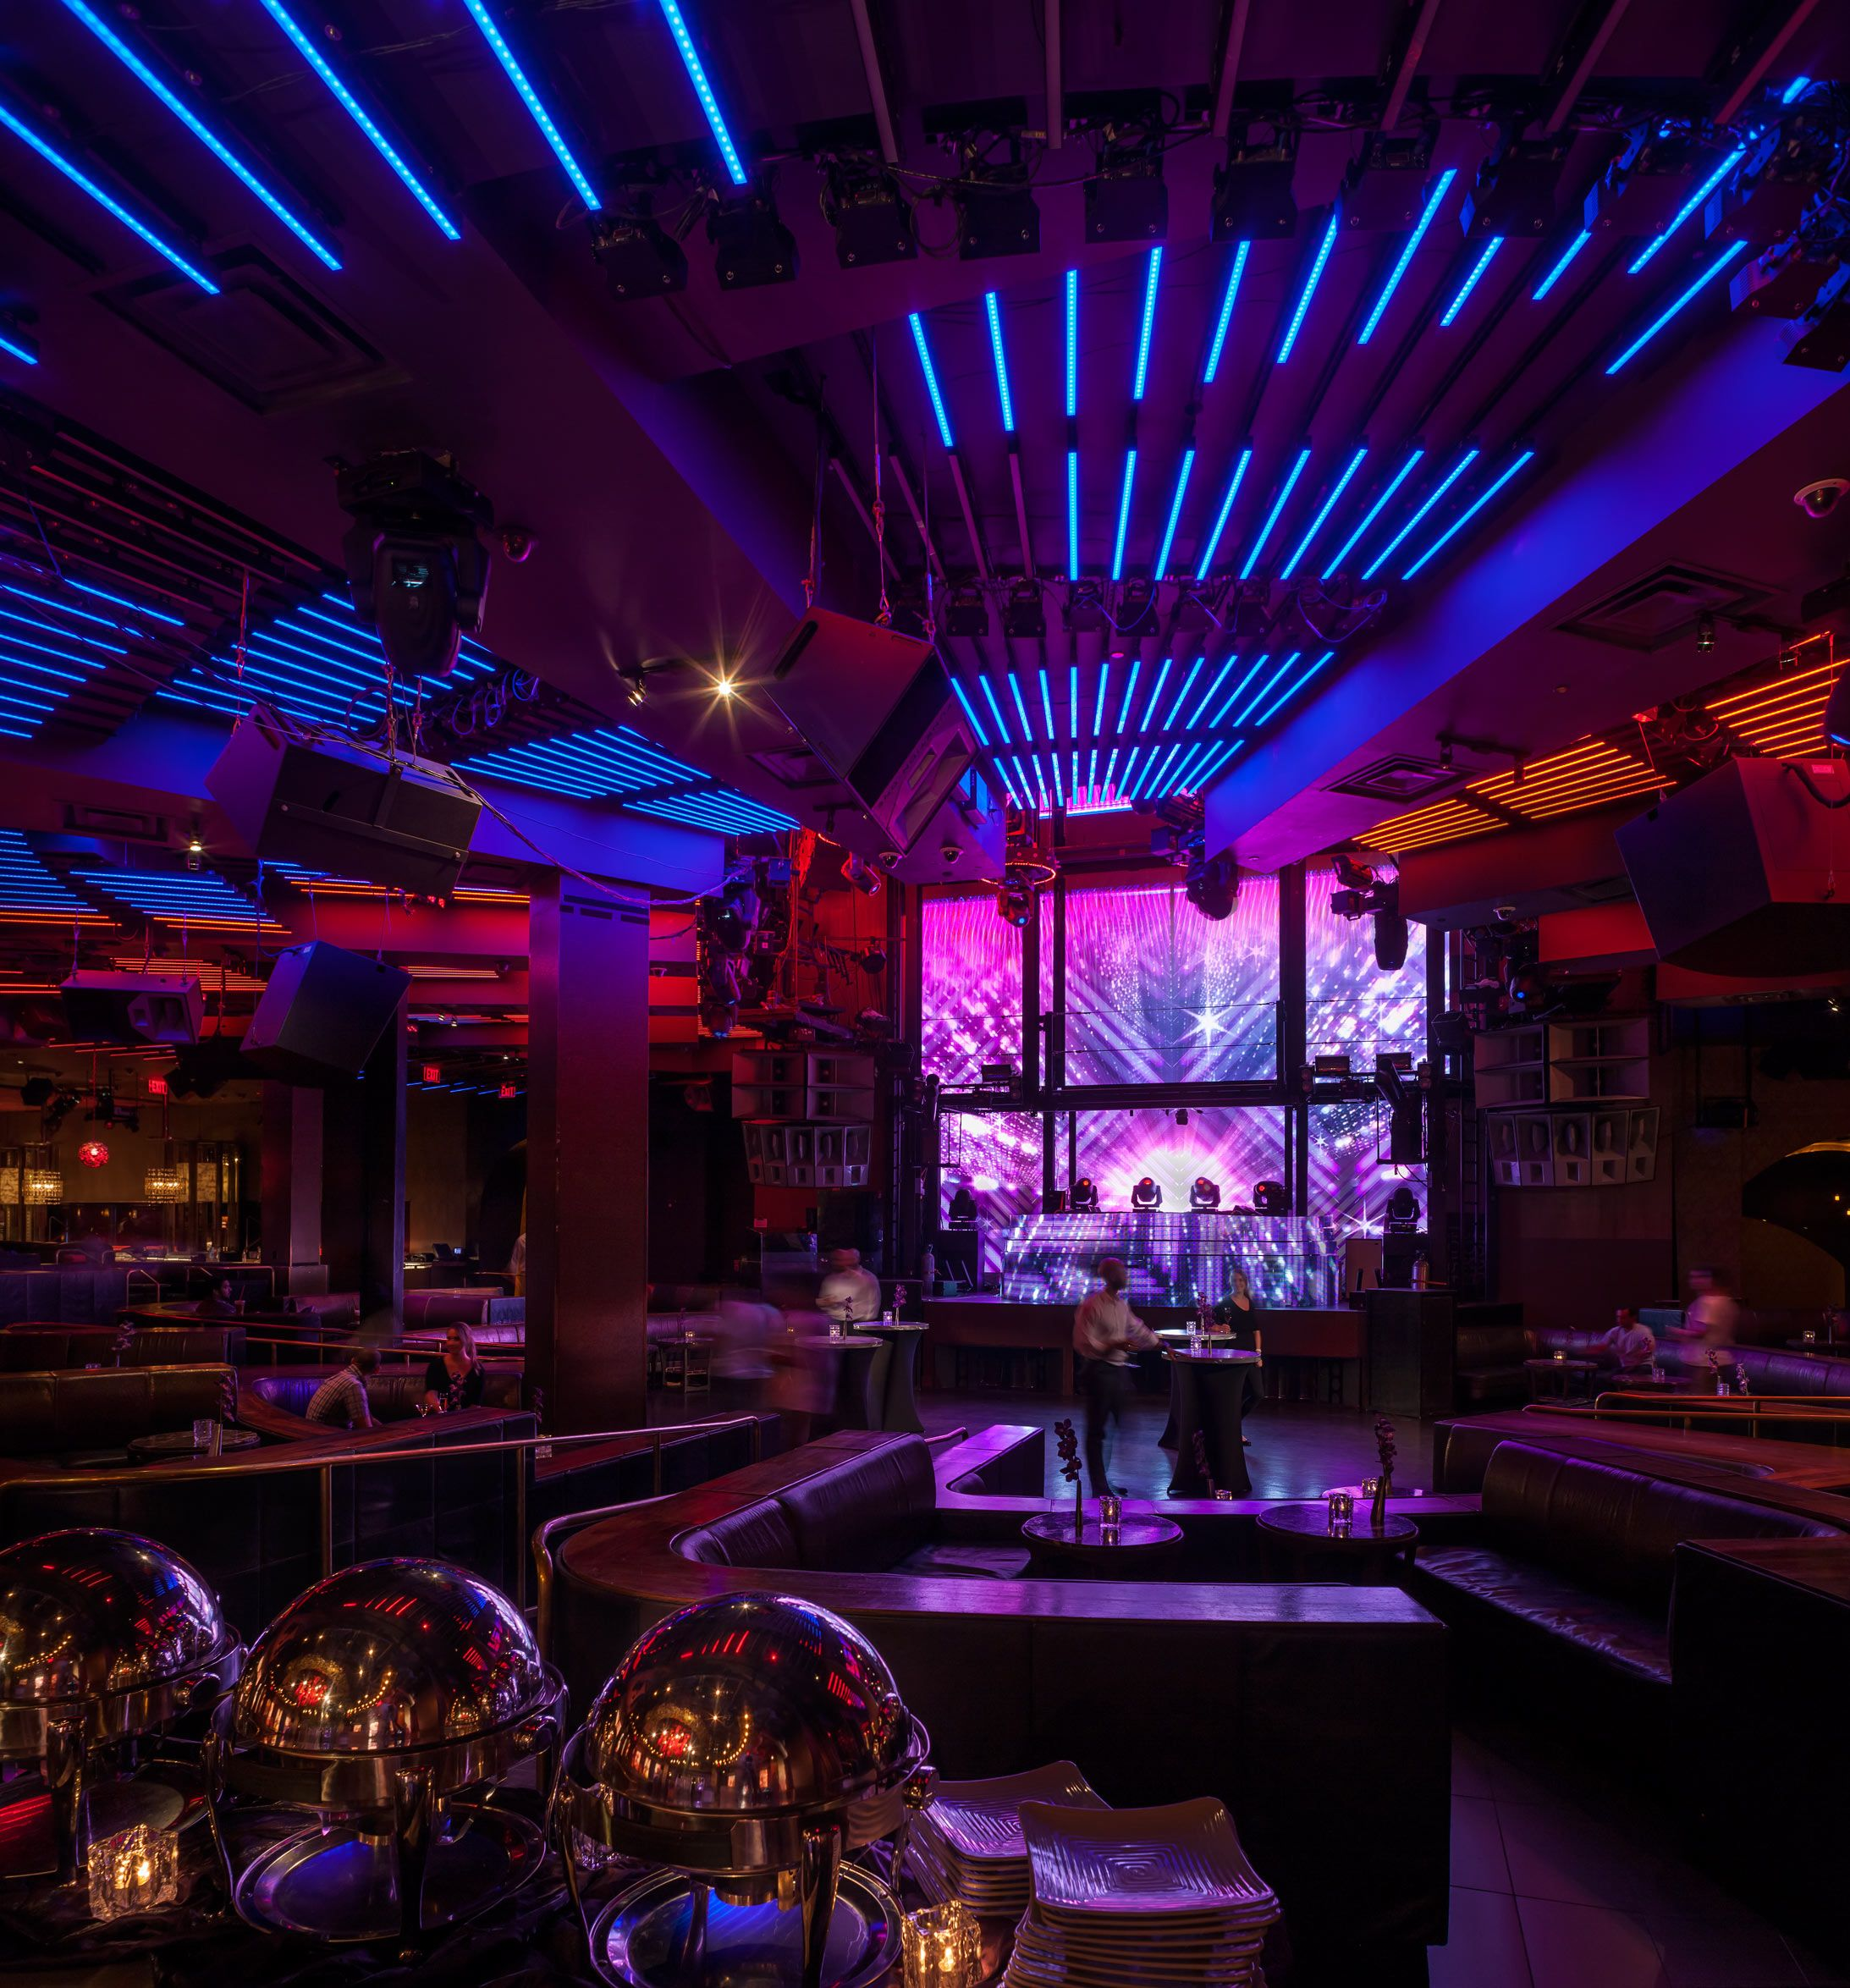 Marquee Las Vegas Nightclub Marquee Nightclub Las Vegas Night Clubs Vegas Clubs